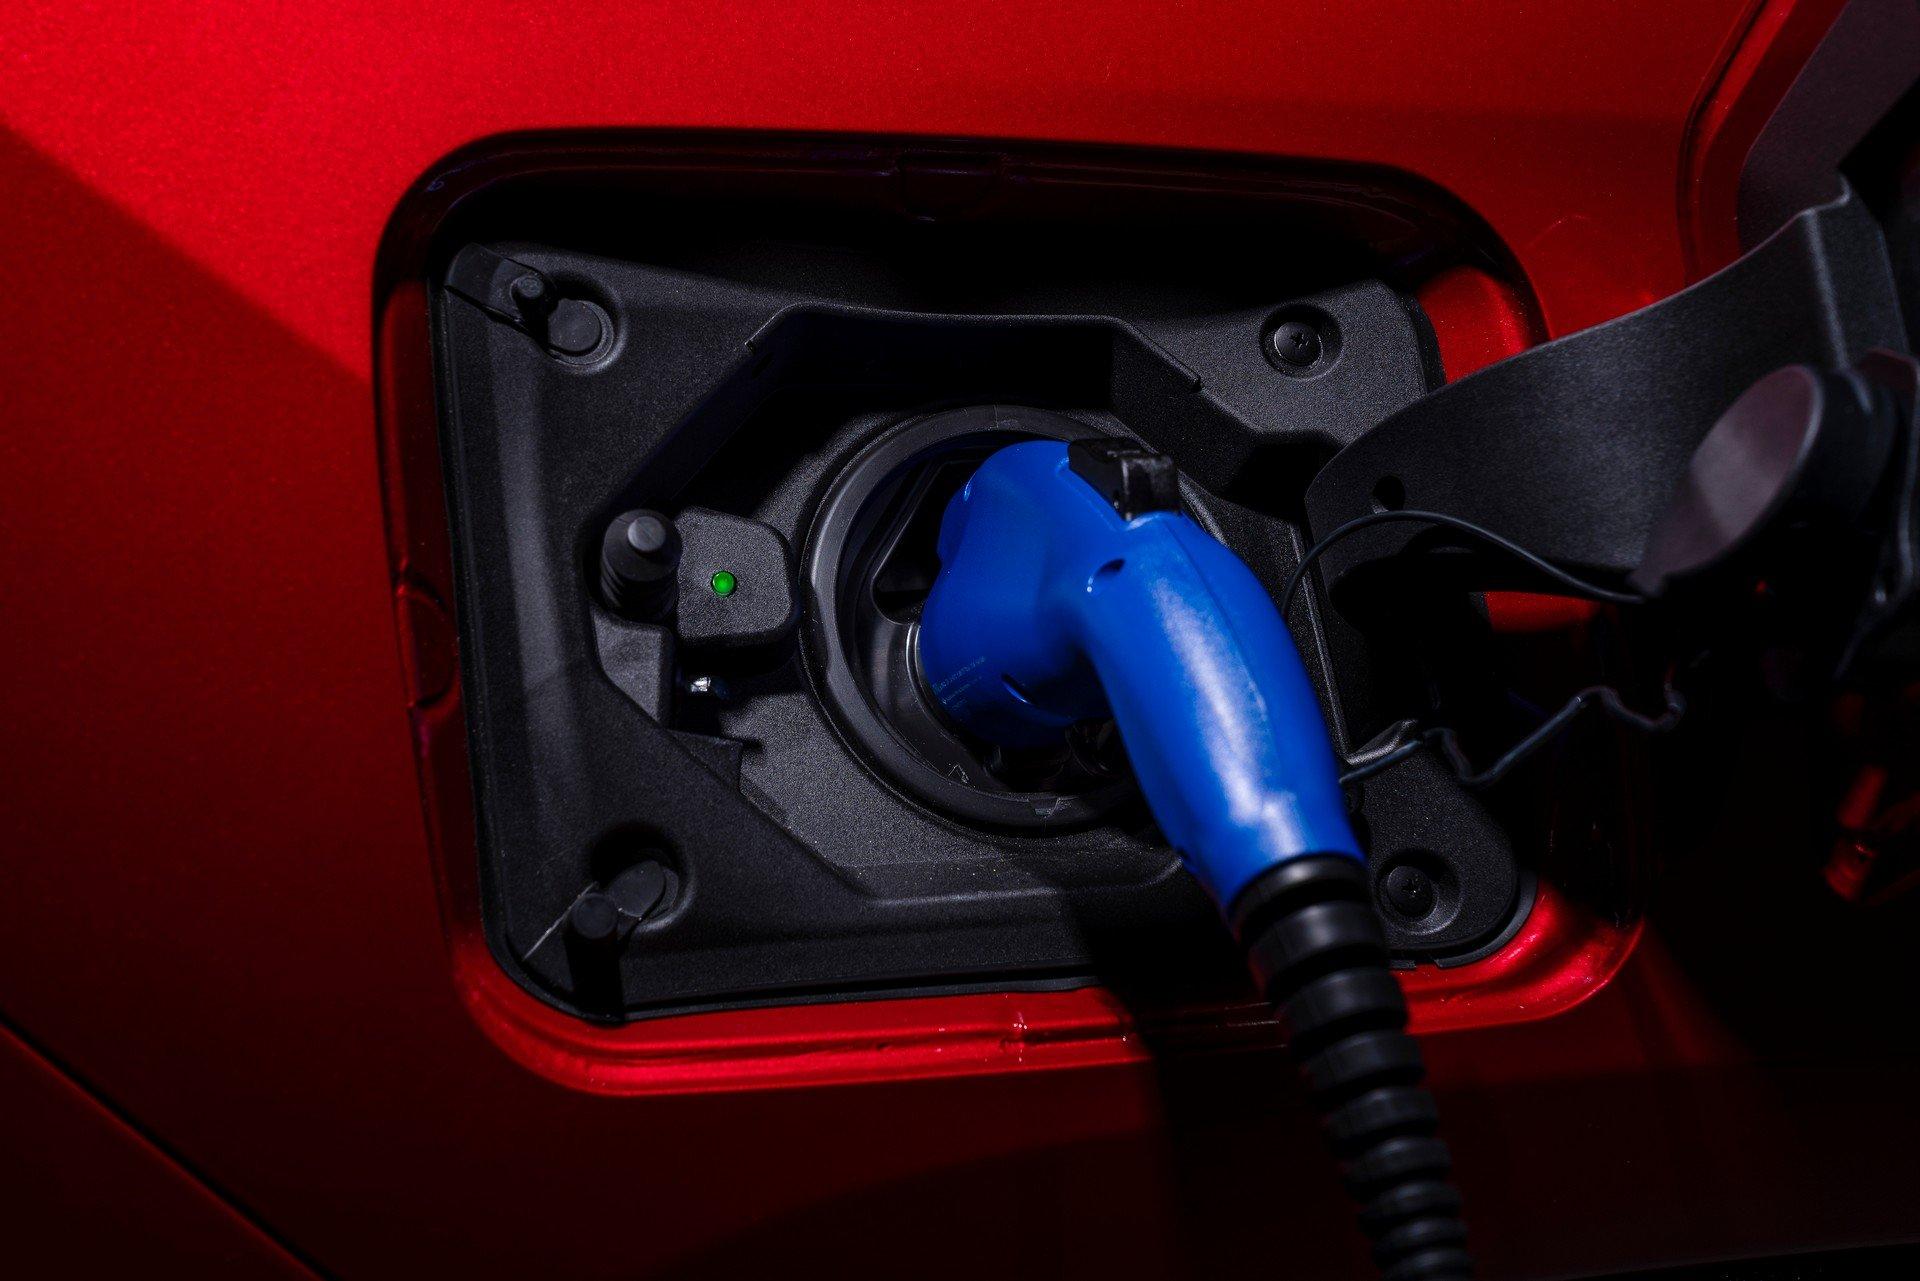 Toyota-RAV4-Plug-in-Hybrid-Prime-2020-21